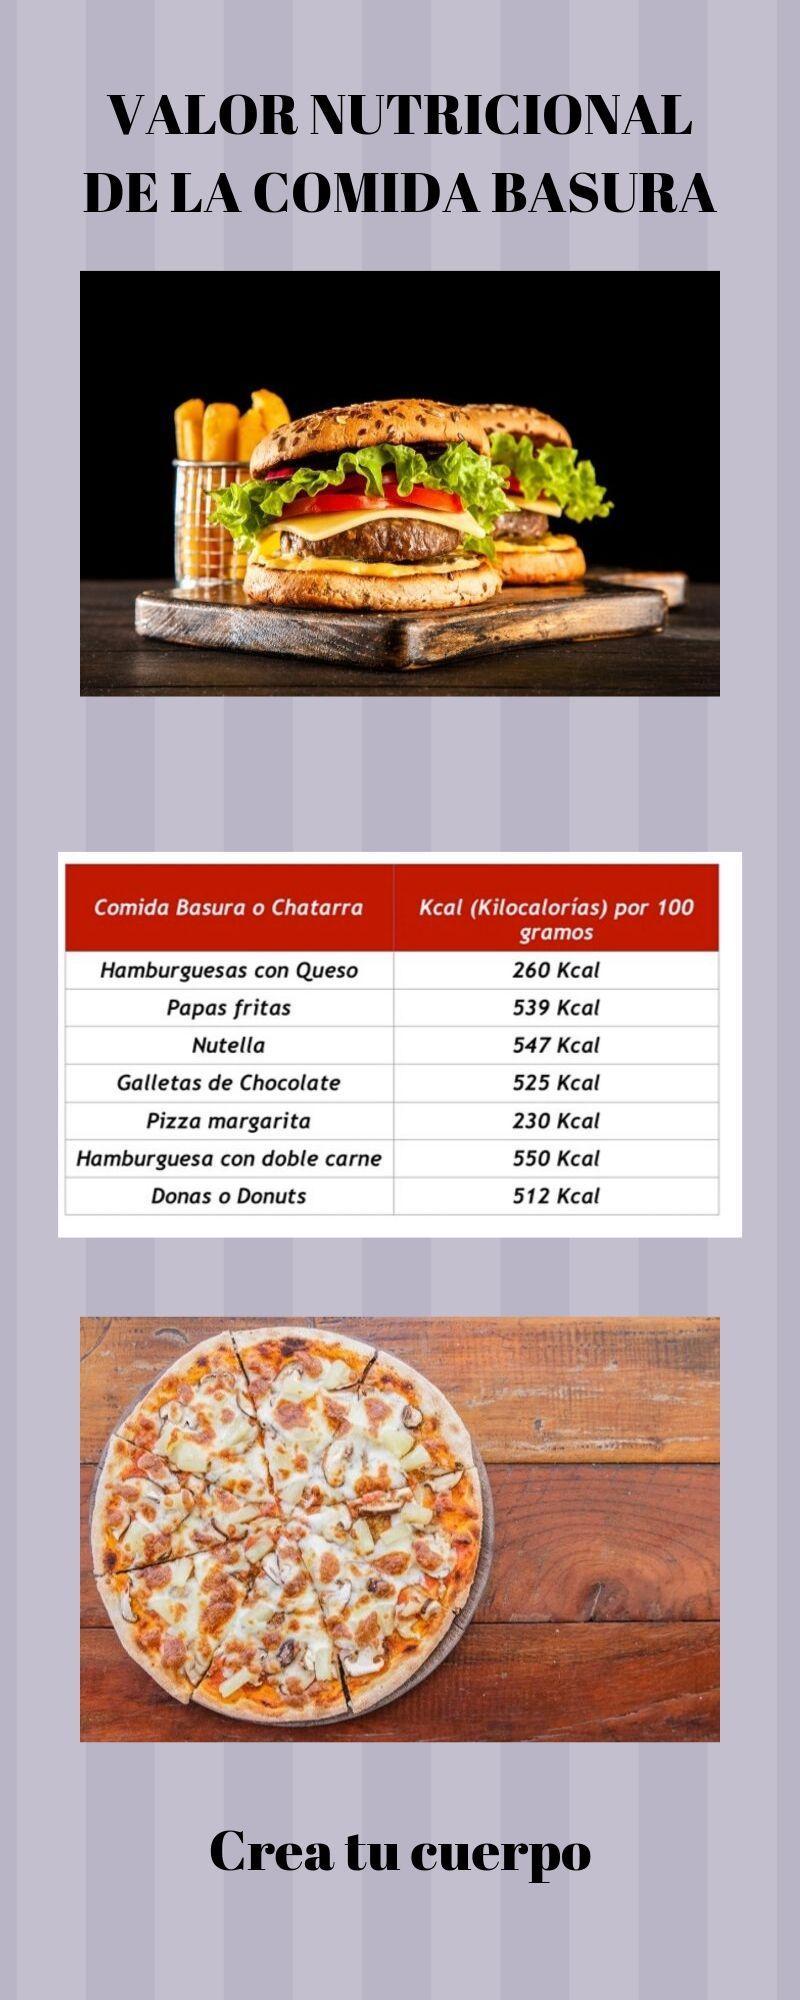 Tabla de calorías de la comida basura